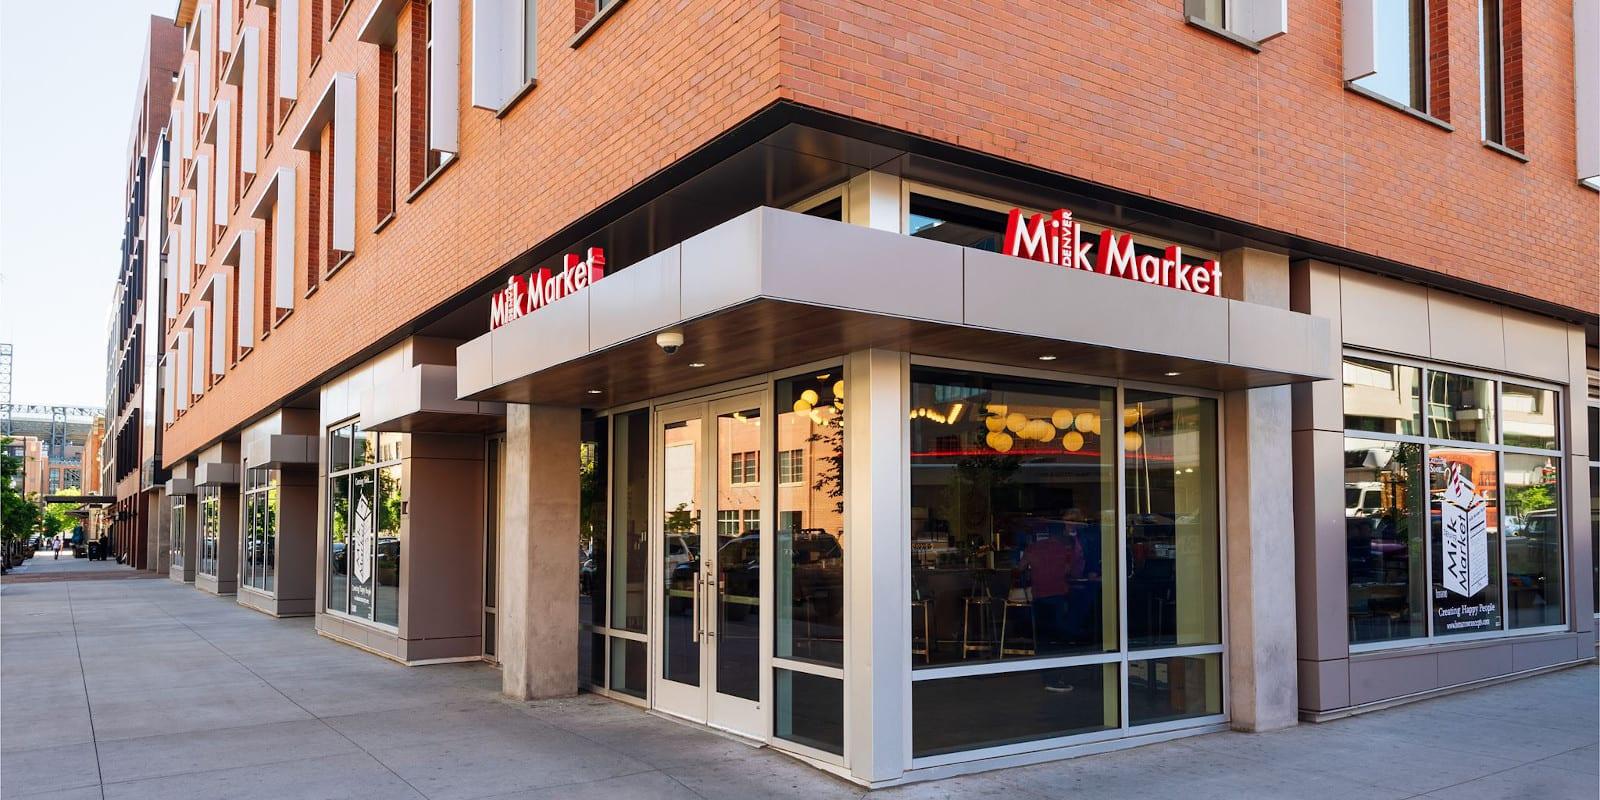 Denver Milk Market, CO